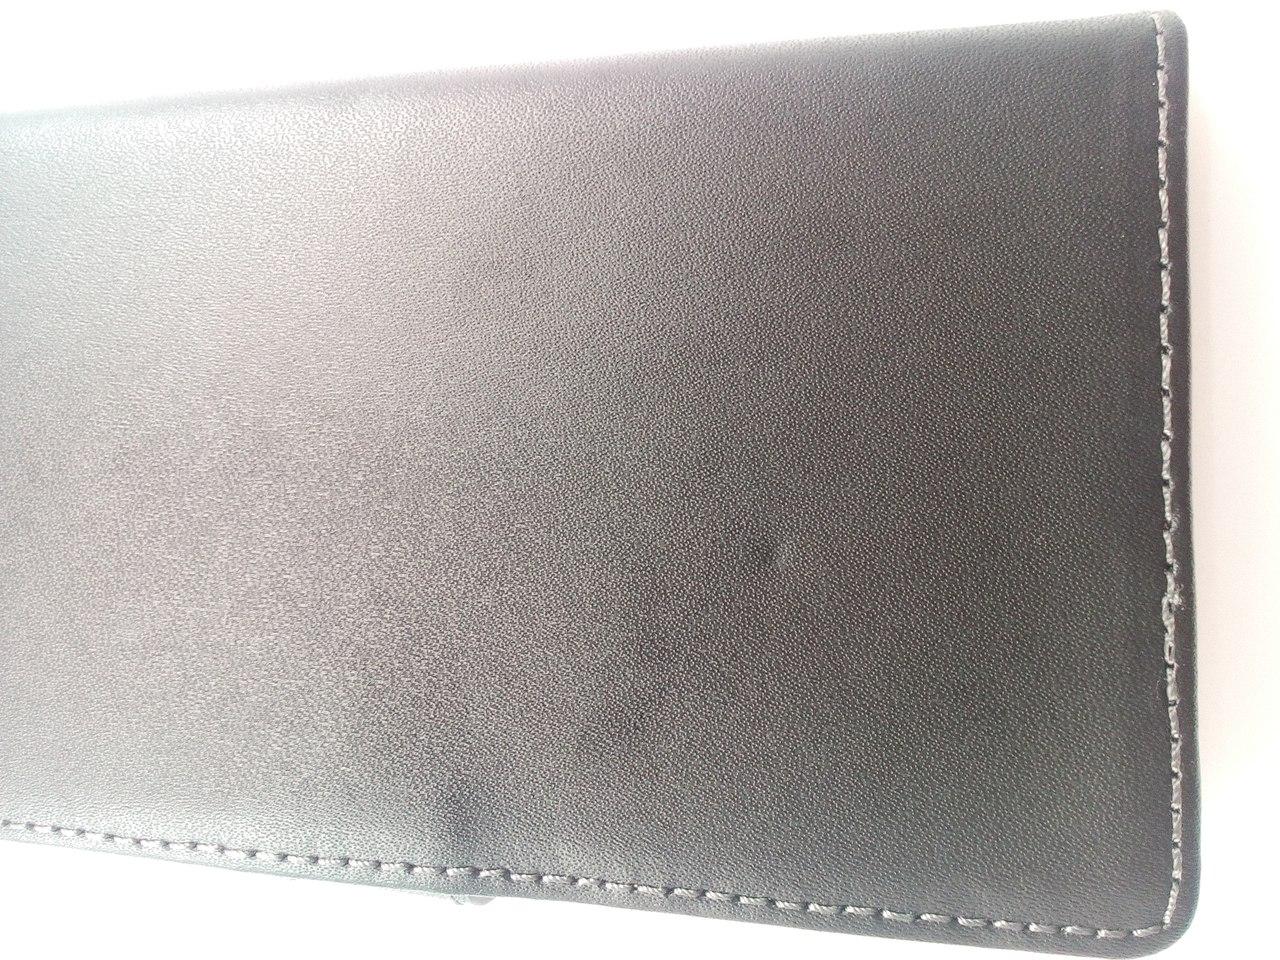 Aliexpress: Чехол-портмоне для Сони Экспериа Z1